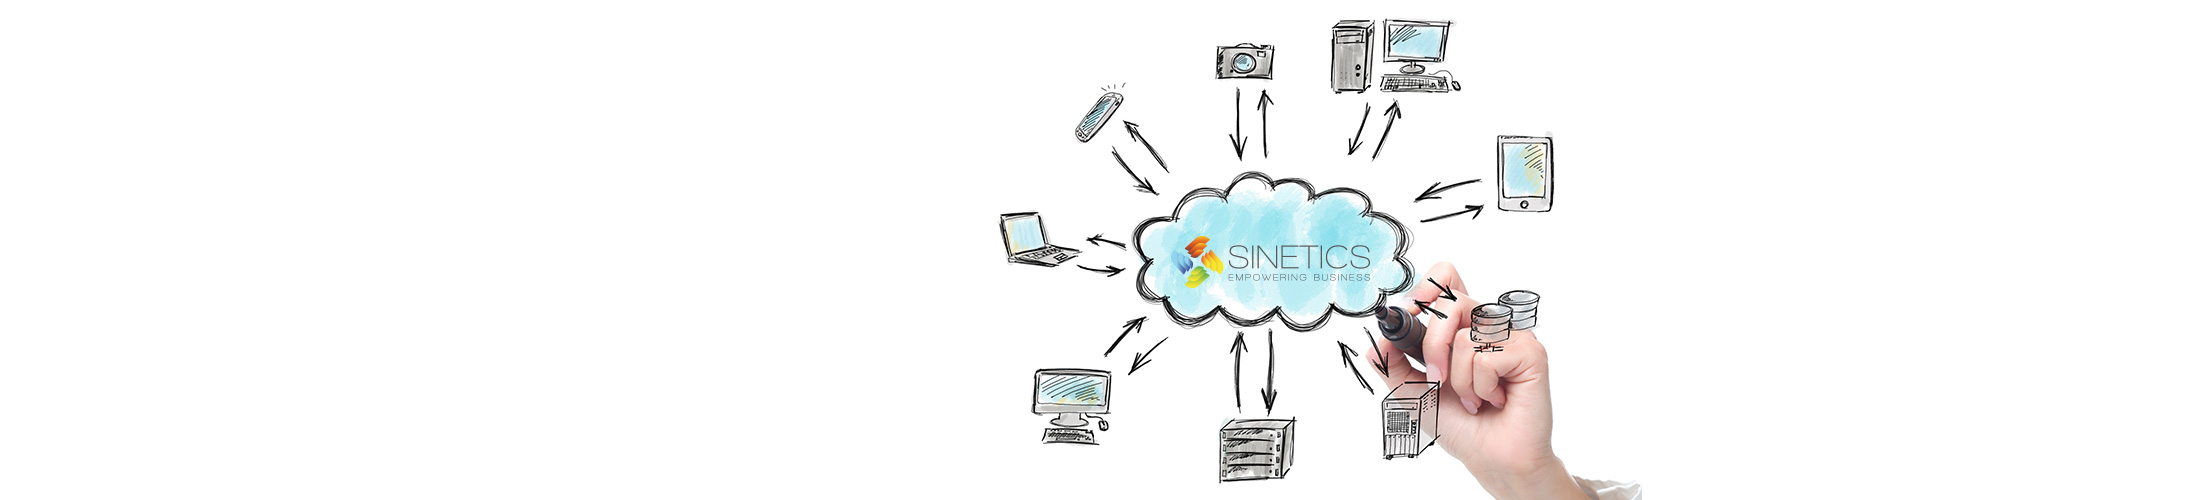 consulenza-informatica-slide-03